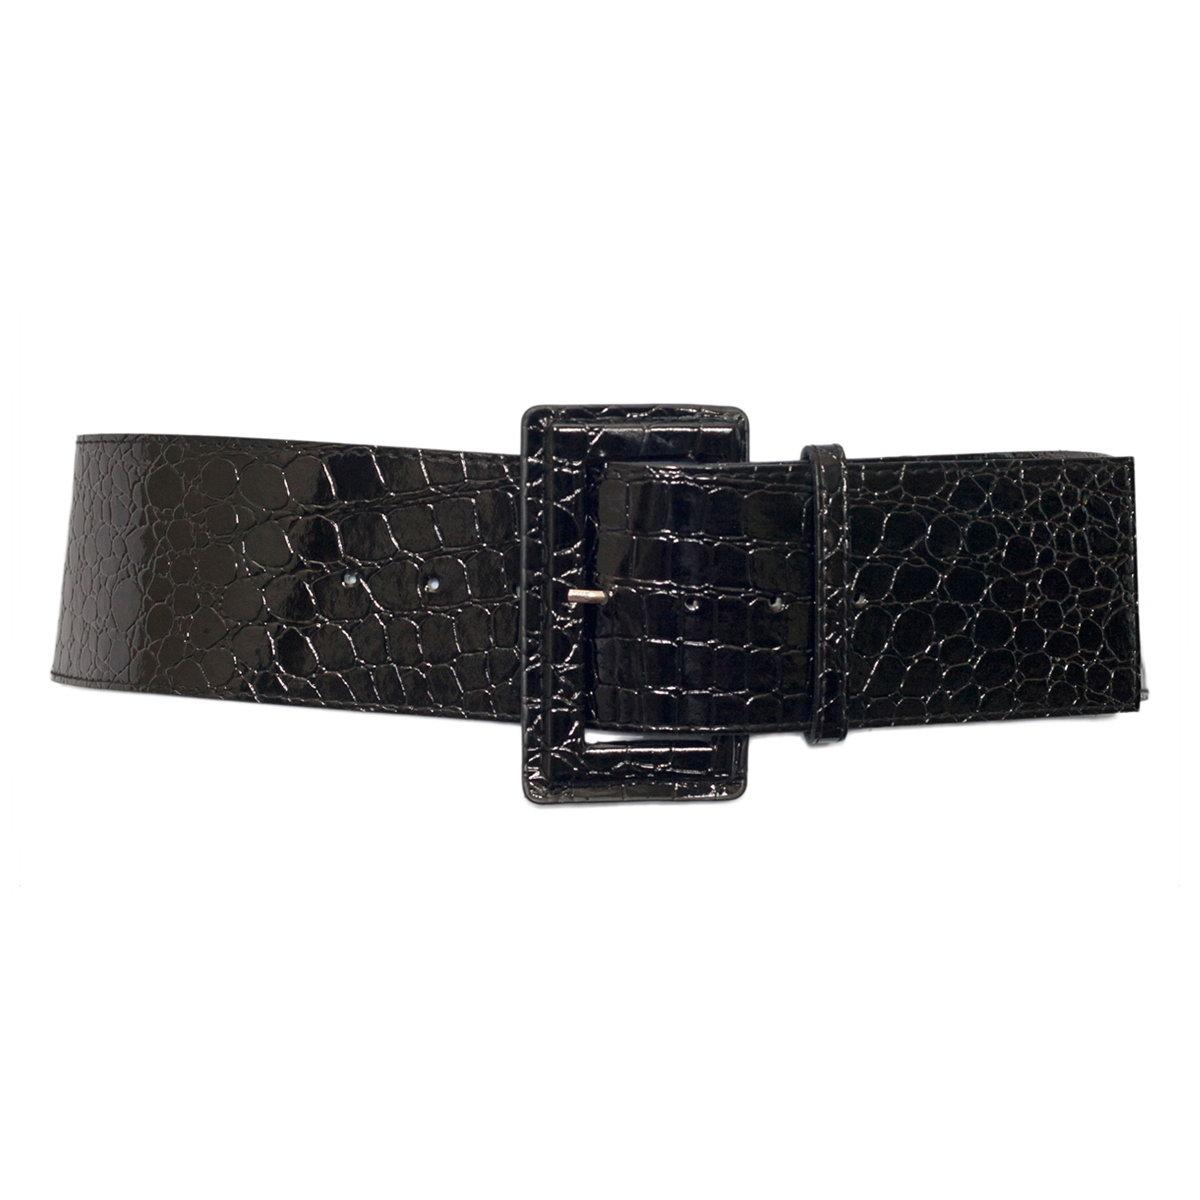 Plus Size Croco Print Patent Leather Belt Black Photo 1